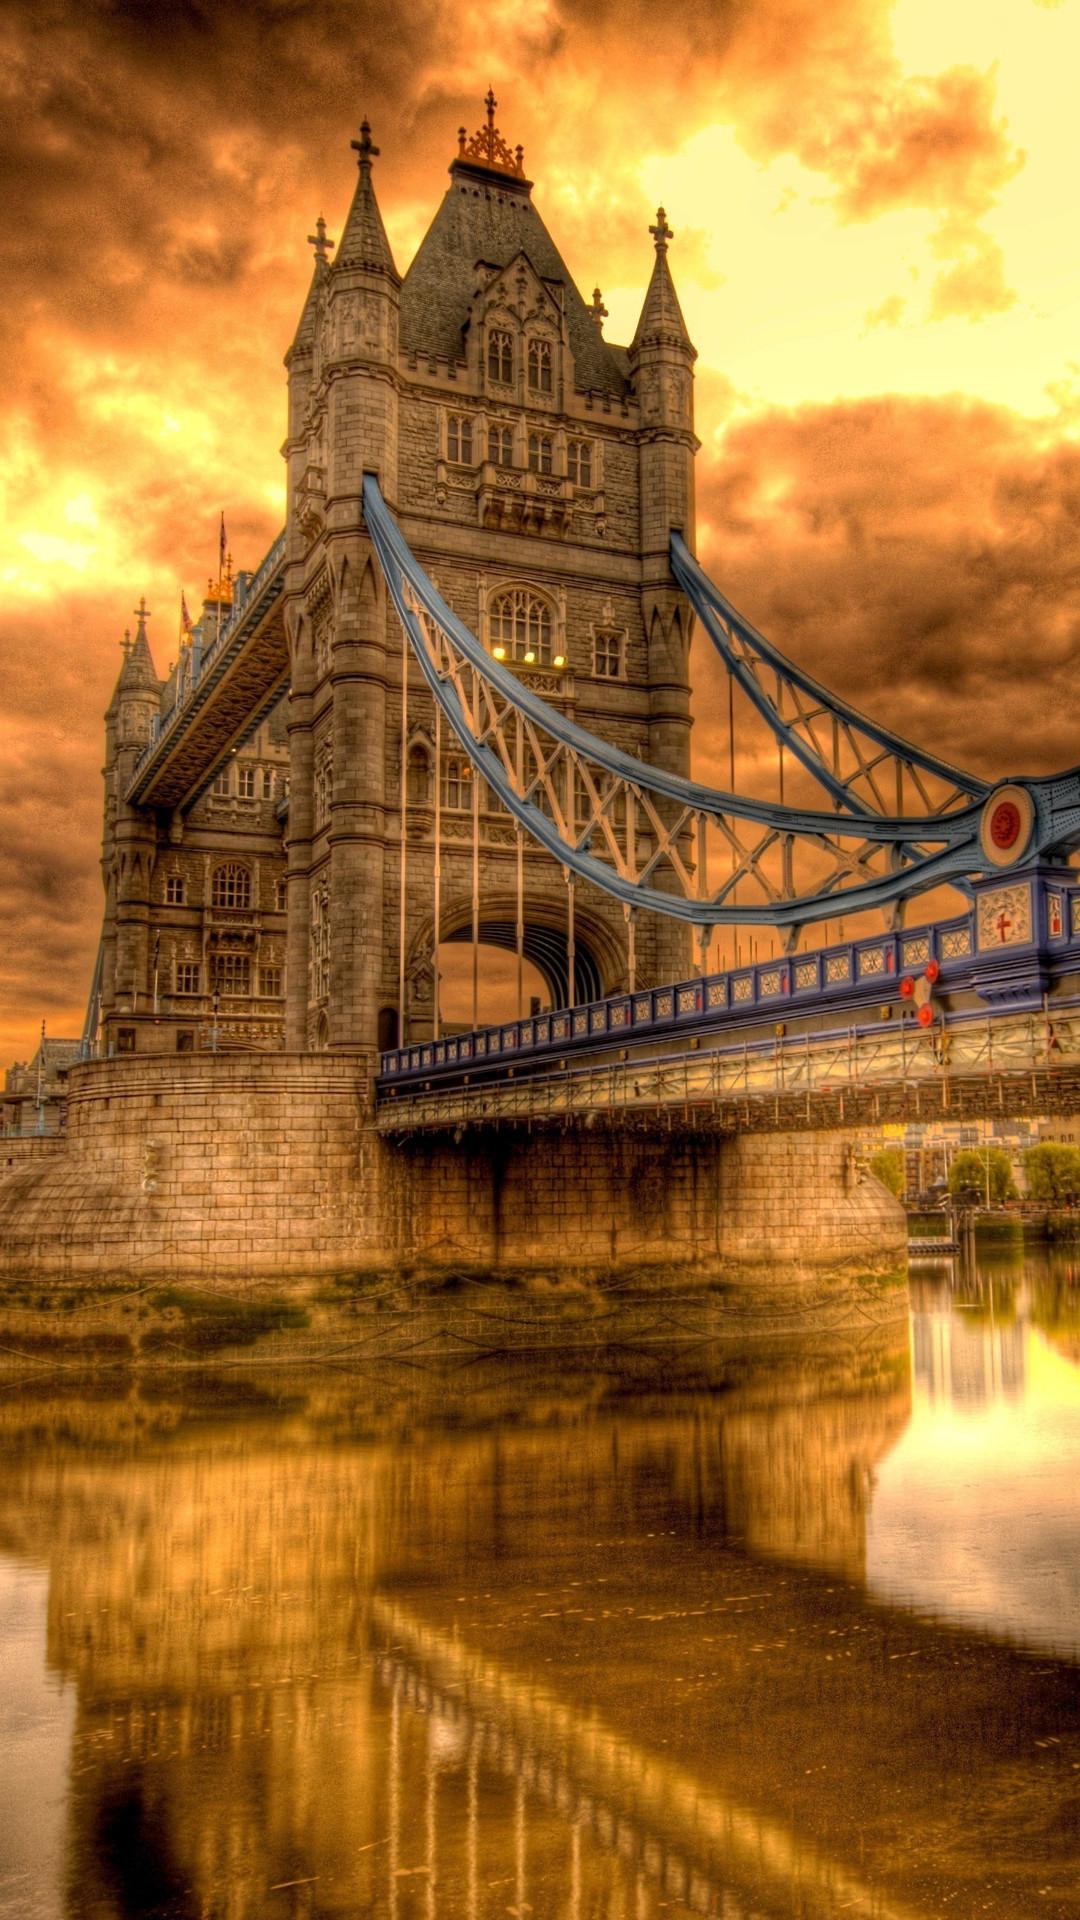 Iphone 5 Wallpaper Free Download Zedge London Bridge Wallpaper 59 Images